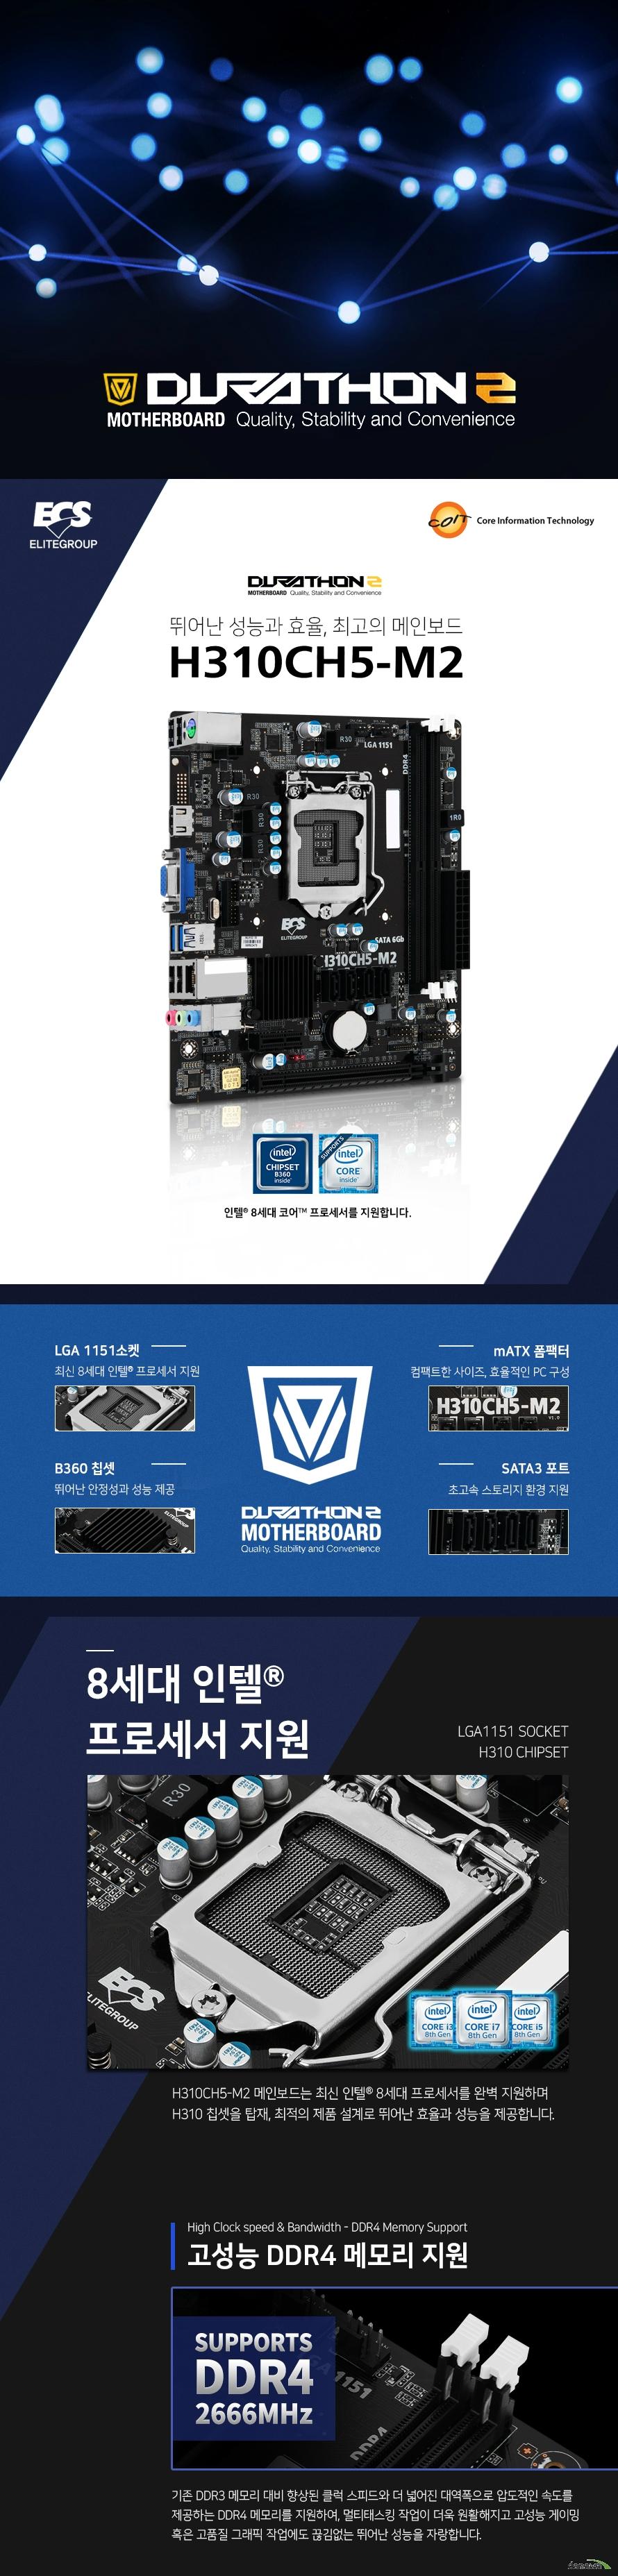 ECS H310CH5-M2  제품 상세 정보  칩셋  인텔 H310 칩셋  지원 프로세서 인텔 LGA 1151소켓 8세대 인텔 코어, 펜티엄, 셀러론 프로세서 지원  메모리 지원  DDR4 DIMM 슬롯 2개 최대 32GB 지원  듀얼채널 2666 2400 메가헤르츠 non ecc 언버퍼드 SDRAM 메모리 모듈 지원  확장 슬롯 PCIE 3.0 16배속 슬롯 1개 및 PCEI 2.0 1배속 슬롯 1개 지원  스토리지 SATA3 포트 4개 지원  USB 포트  USB 3.1 gen 1 후면 2개 및 전면 2개 총 4개 지원 USB 2.0 후면4개 및  전면 2개 총 6개 지원  리얼텍 RTL811H 기가비트 랜 지원  리얼텍 ALC662 6채널 HD 오디오 지원  AMI BIOS with 64MB SPI Flash ROM   윈도우 10 64비트 운영체제 지원  MATX 폼팩터 길이 190밀리미터 넓이 170밀리미터 3년 무상 보증 KC 인증번호 R-R-ETW-H310CH5-M2 제조사의 사정에 따라 사전고지 없이 일부 제품 사양이 변경될 수 있습니다. 구매 전 사용하시는 부품과 CPU 프로세서 등 장착 지원 여부를 확인하시기 바랍니다.  구성품  드라이버 설치 CD  사용자 설명서 IO쉴드 SATA3 커넥터